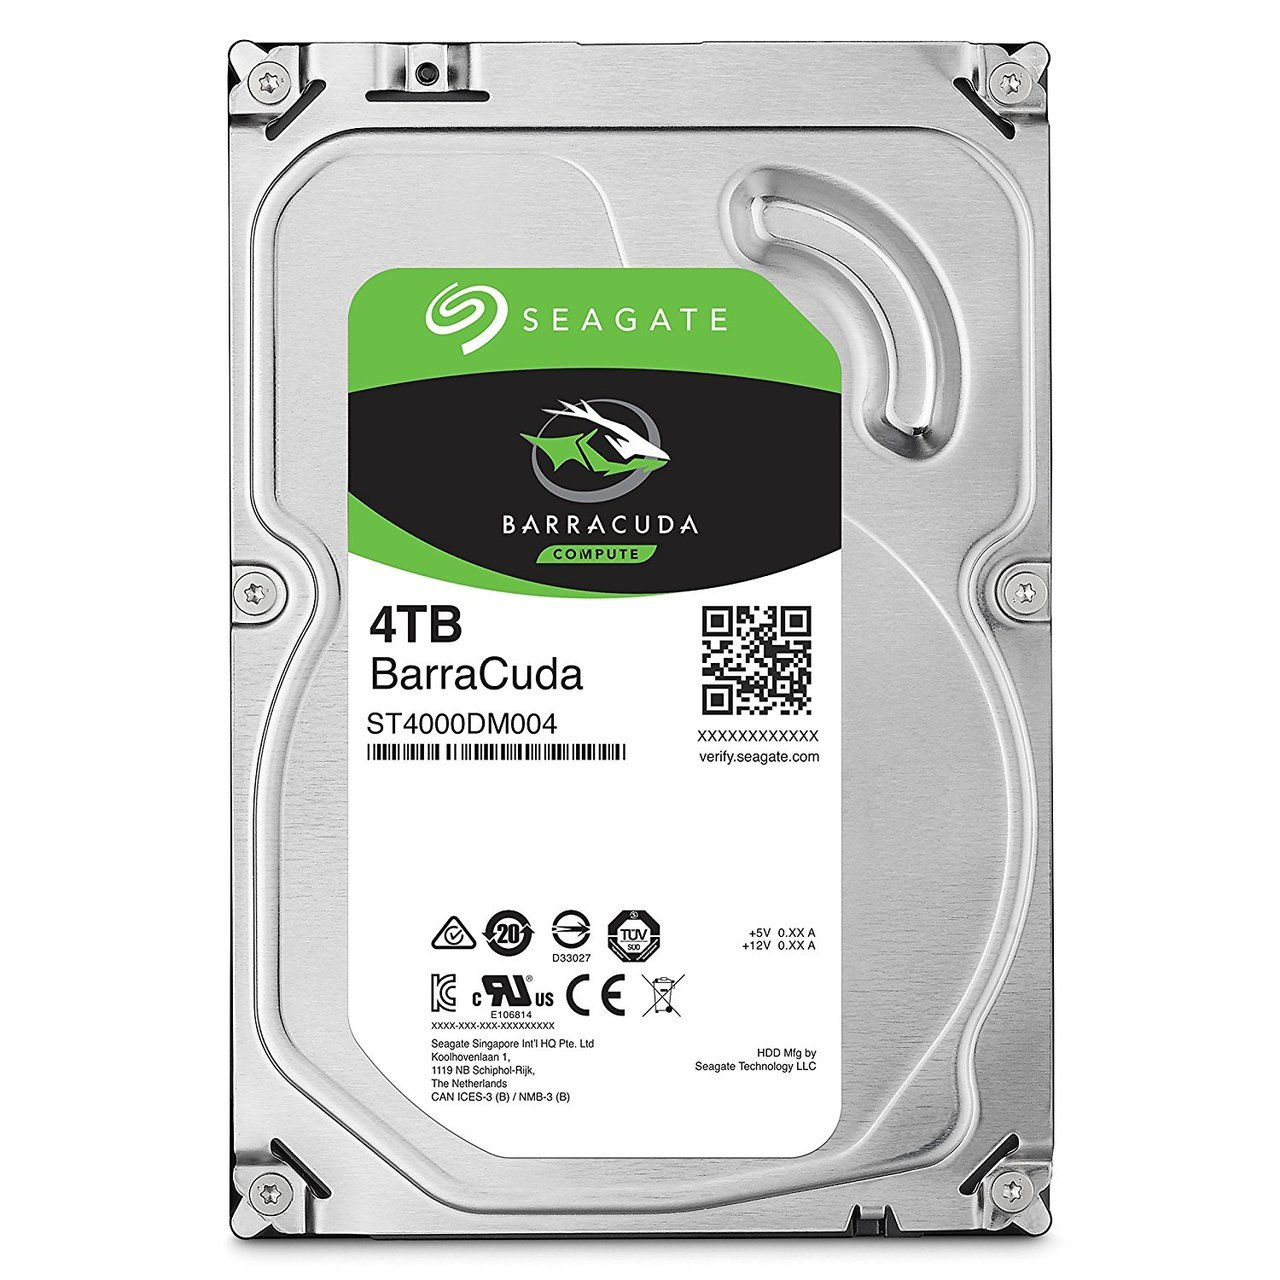 Seagate 4TB BarraCuda SATA 6Gbs 256MB Cache 3.5-Inch Internal Hard Drive